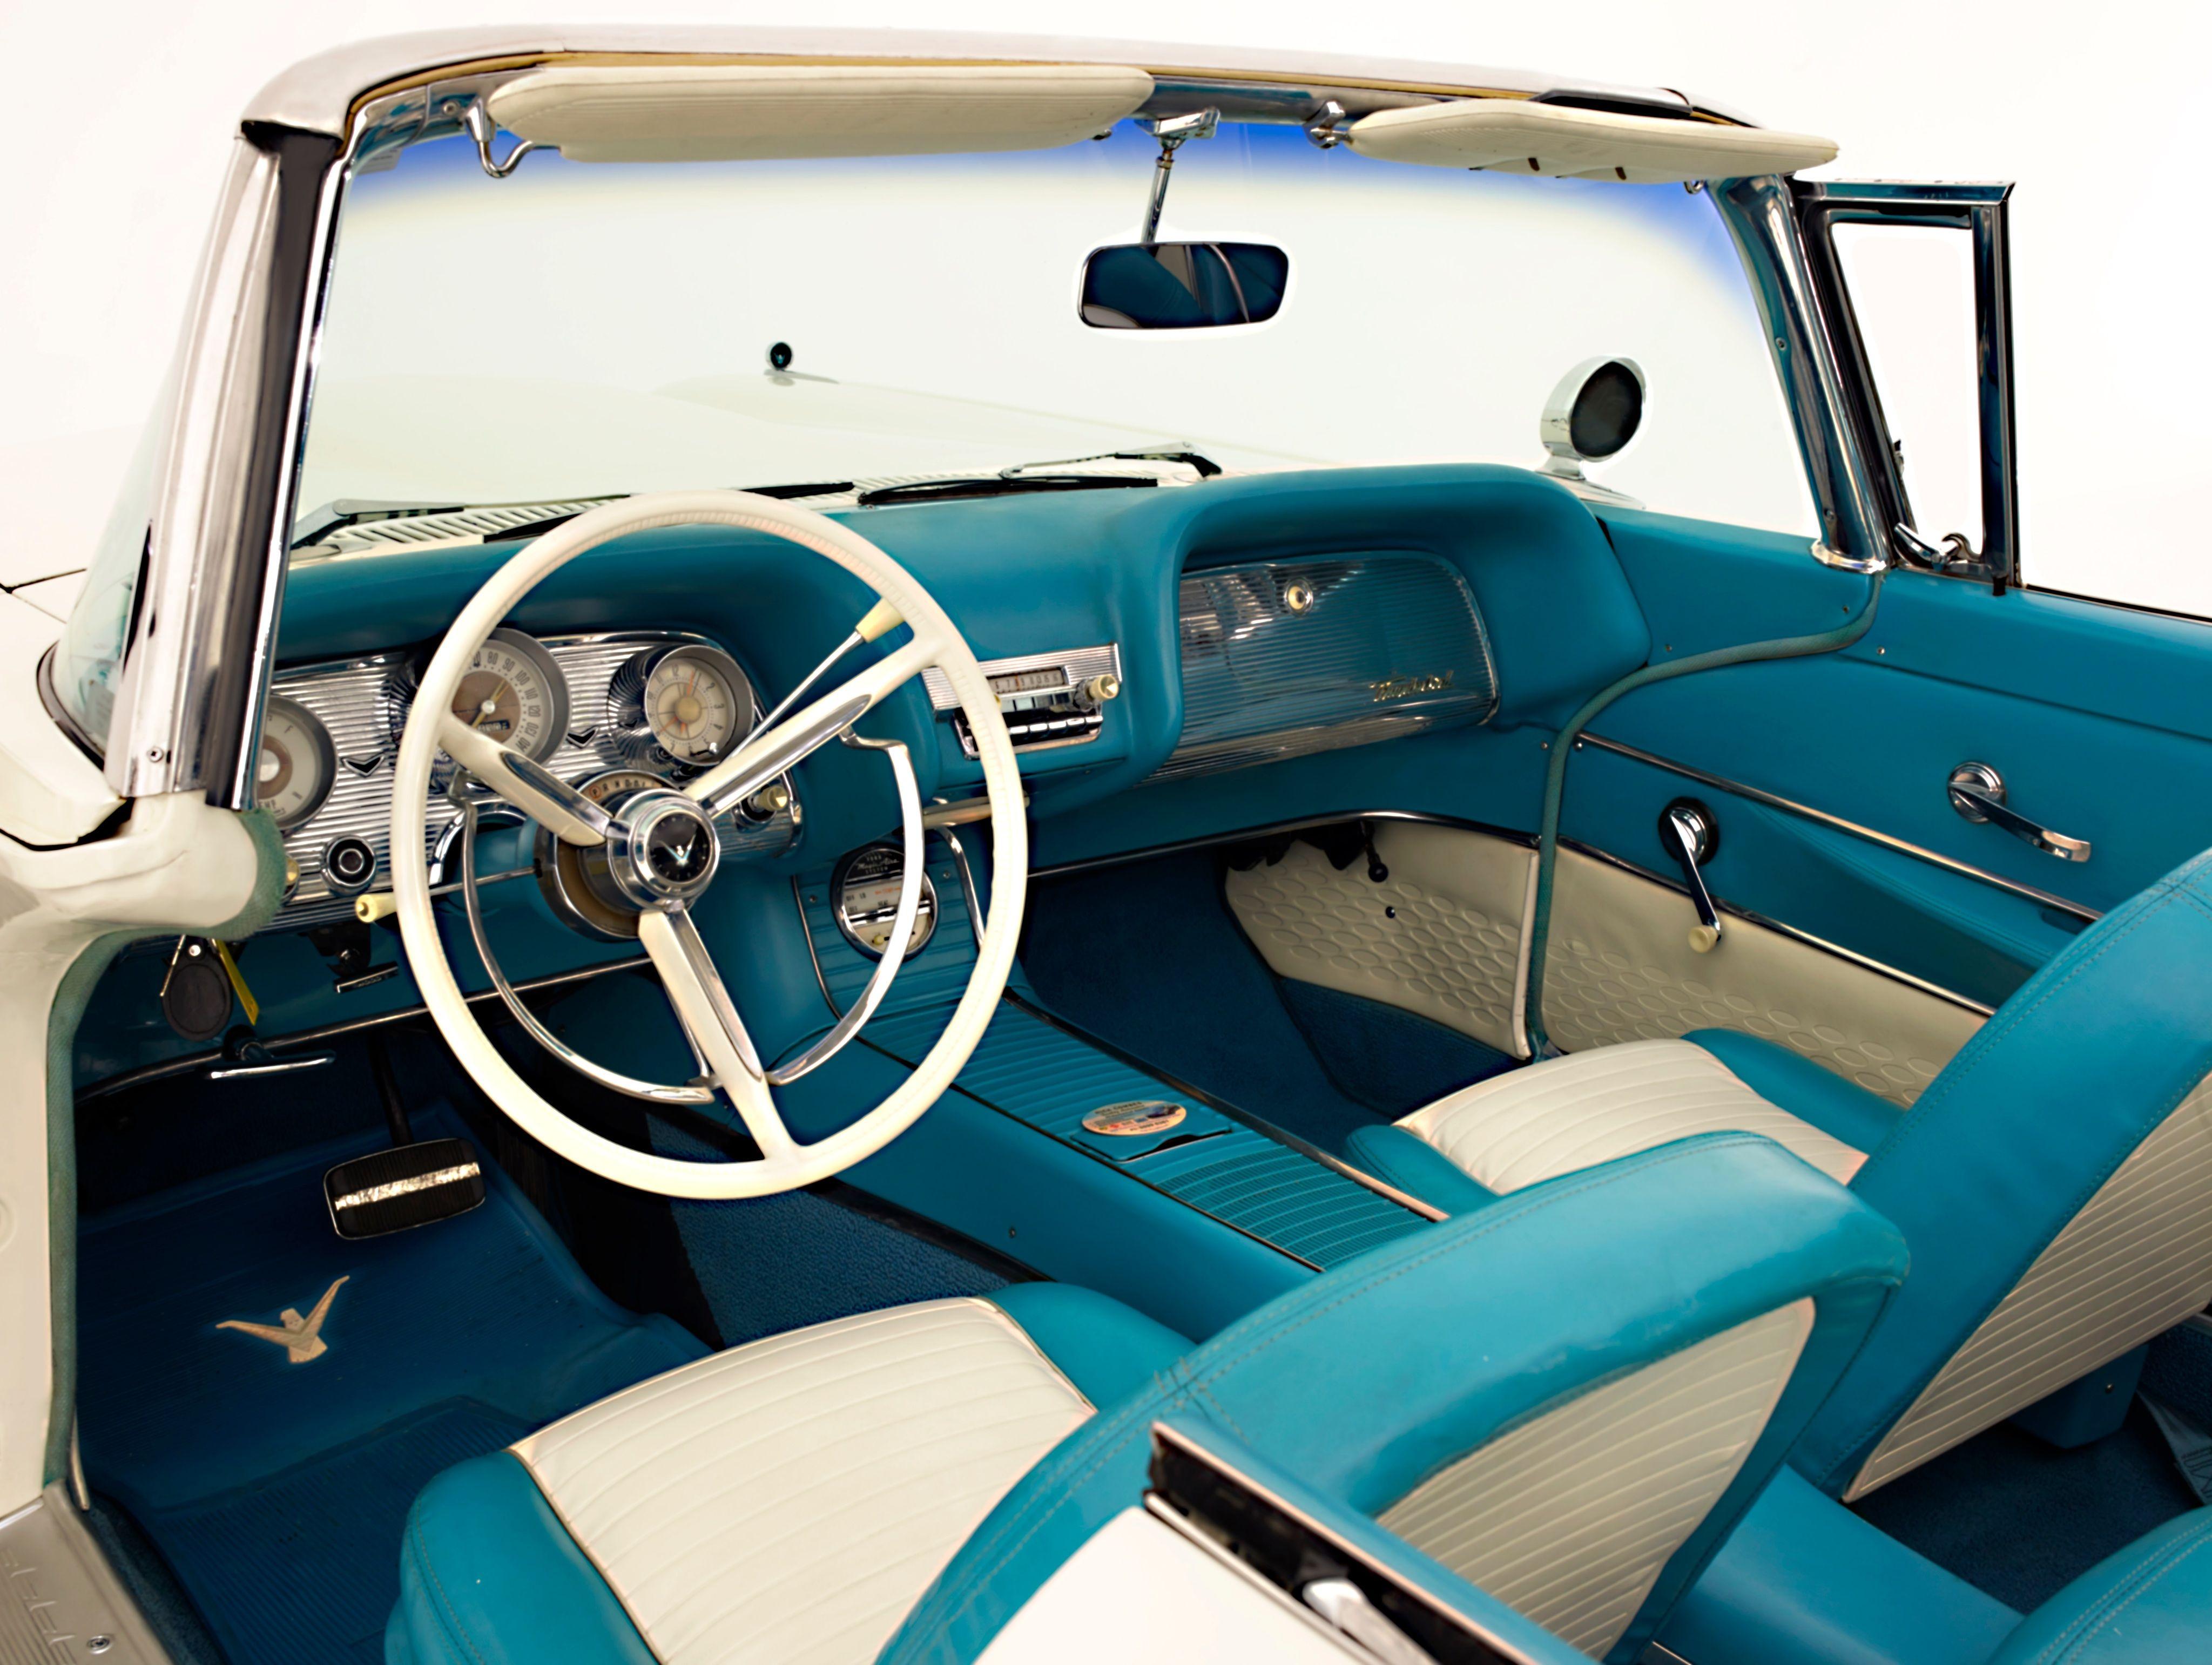 1959 Ford Thunderbird Interior Ford Thunderbird Beautiful Cars Thunderbird